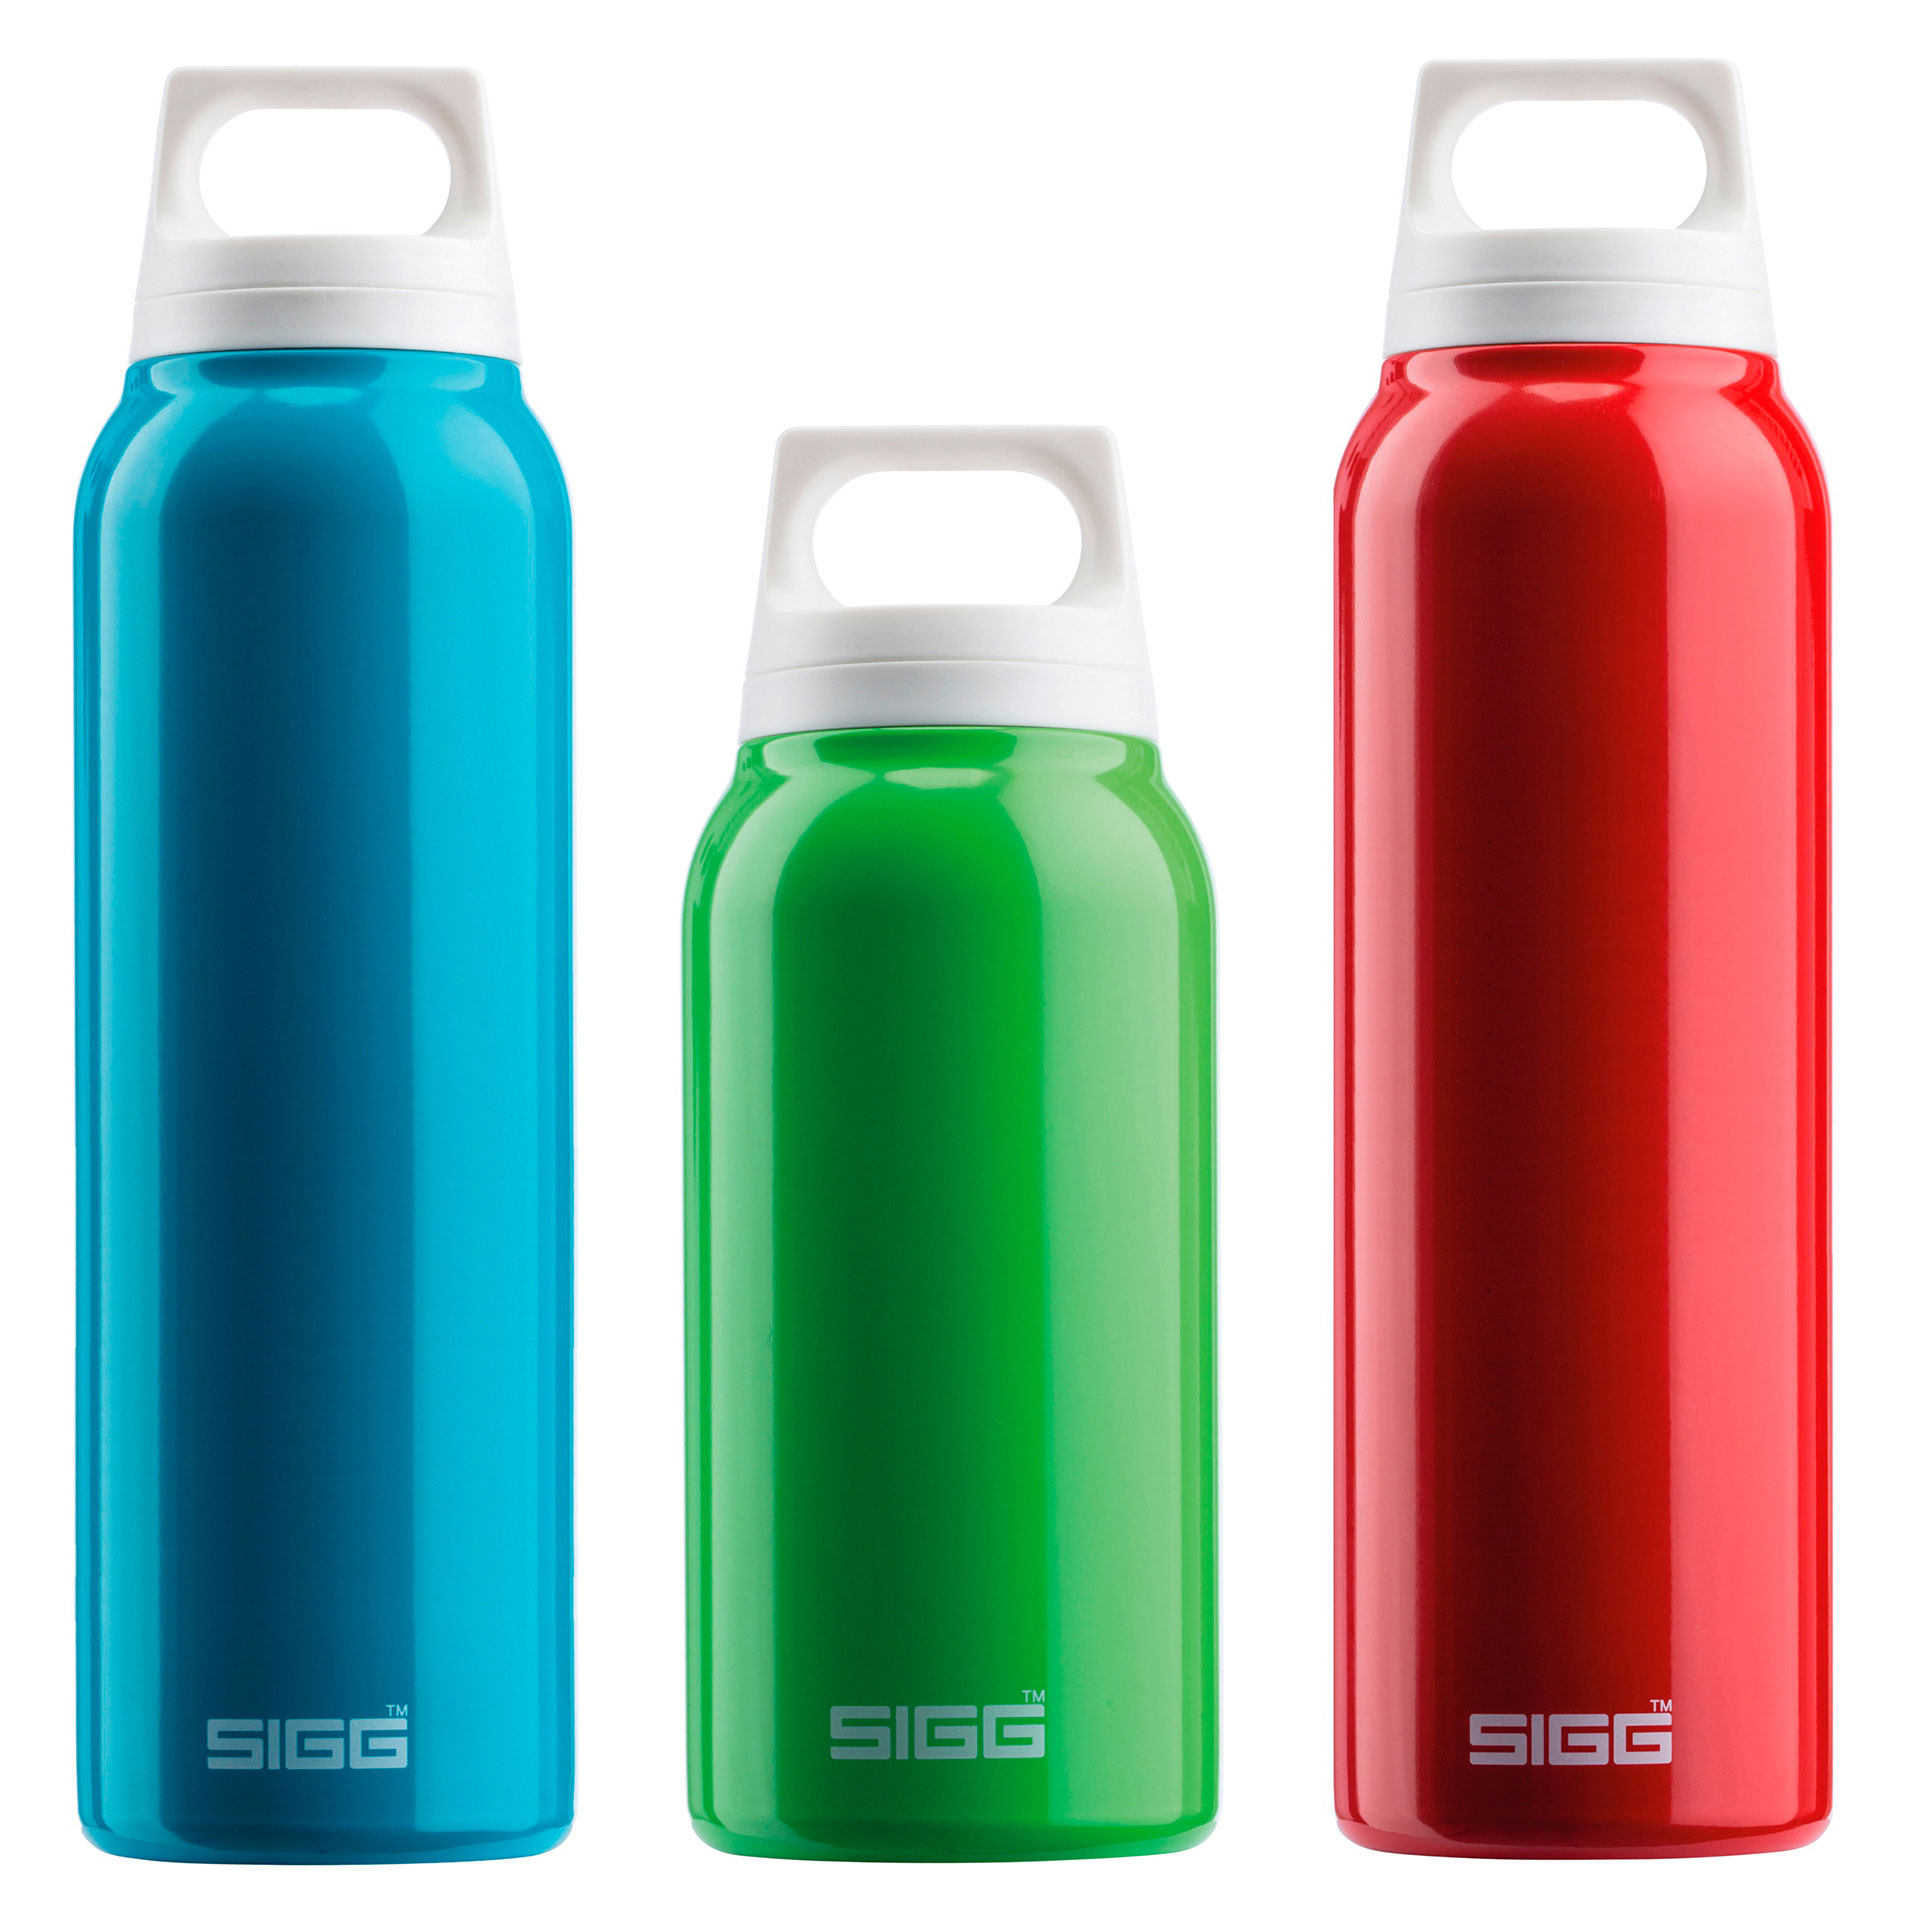 CLRFLXS® DAY 02: SIGG Hot and Cold heizt farbenfroh dem Winter ein